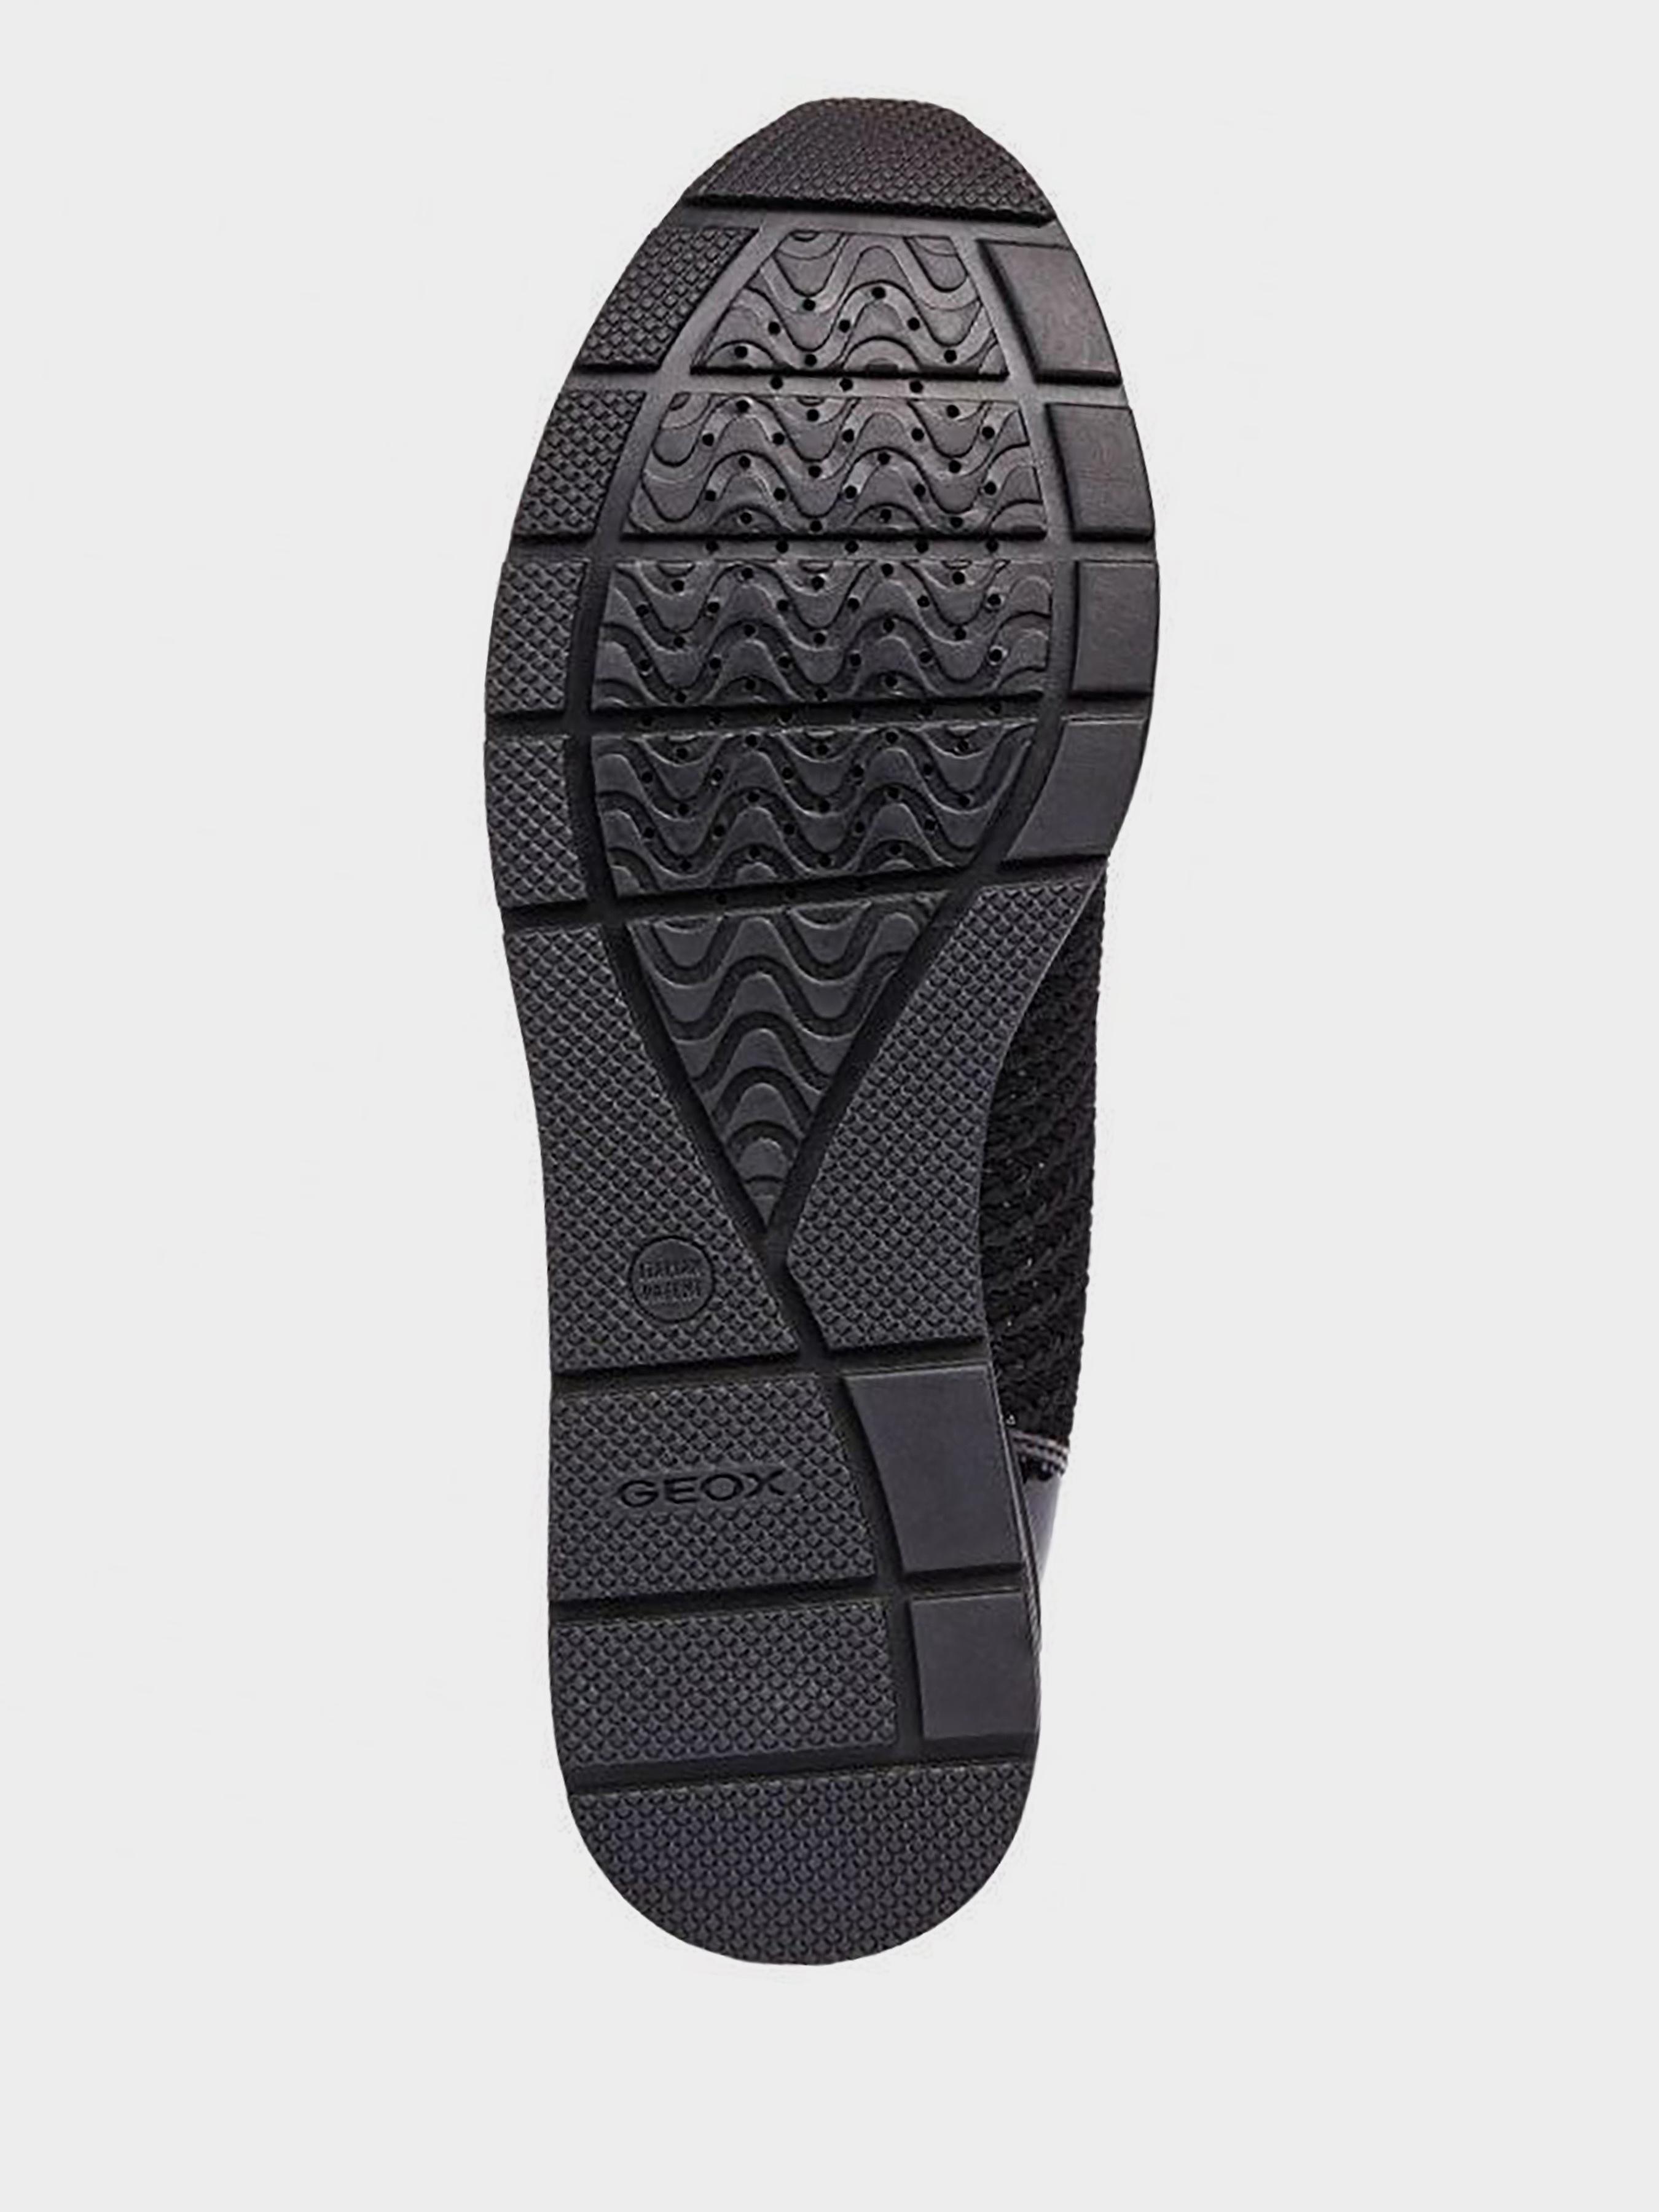 Ботинки для женщин Geox ZOSMA XW3365 модная обувь, 2017